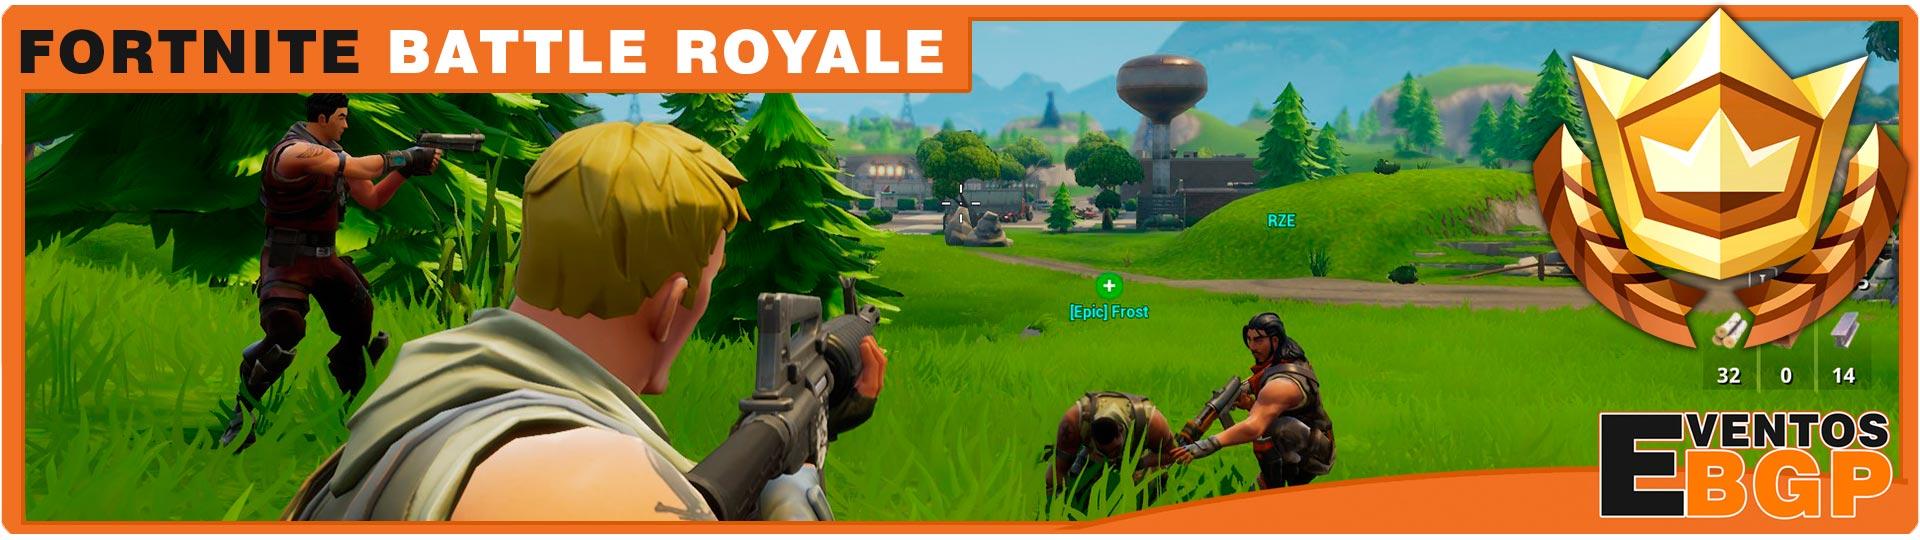 Fortnite Battle Royale [Videojuegos] - Alquiler consolas Banner